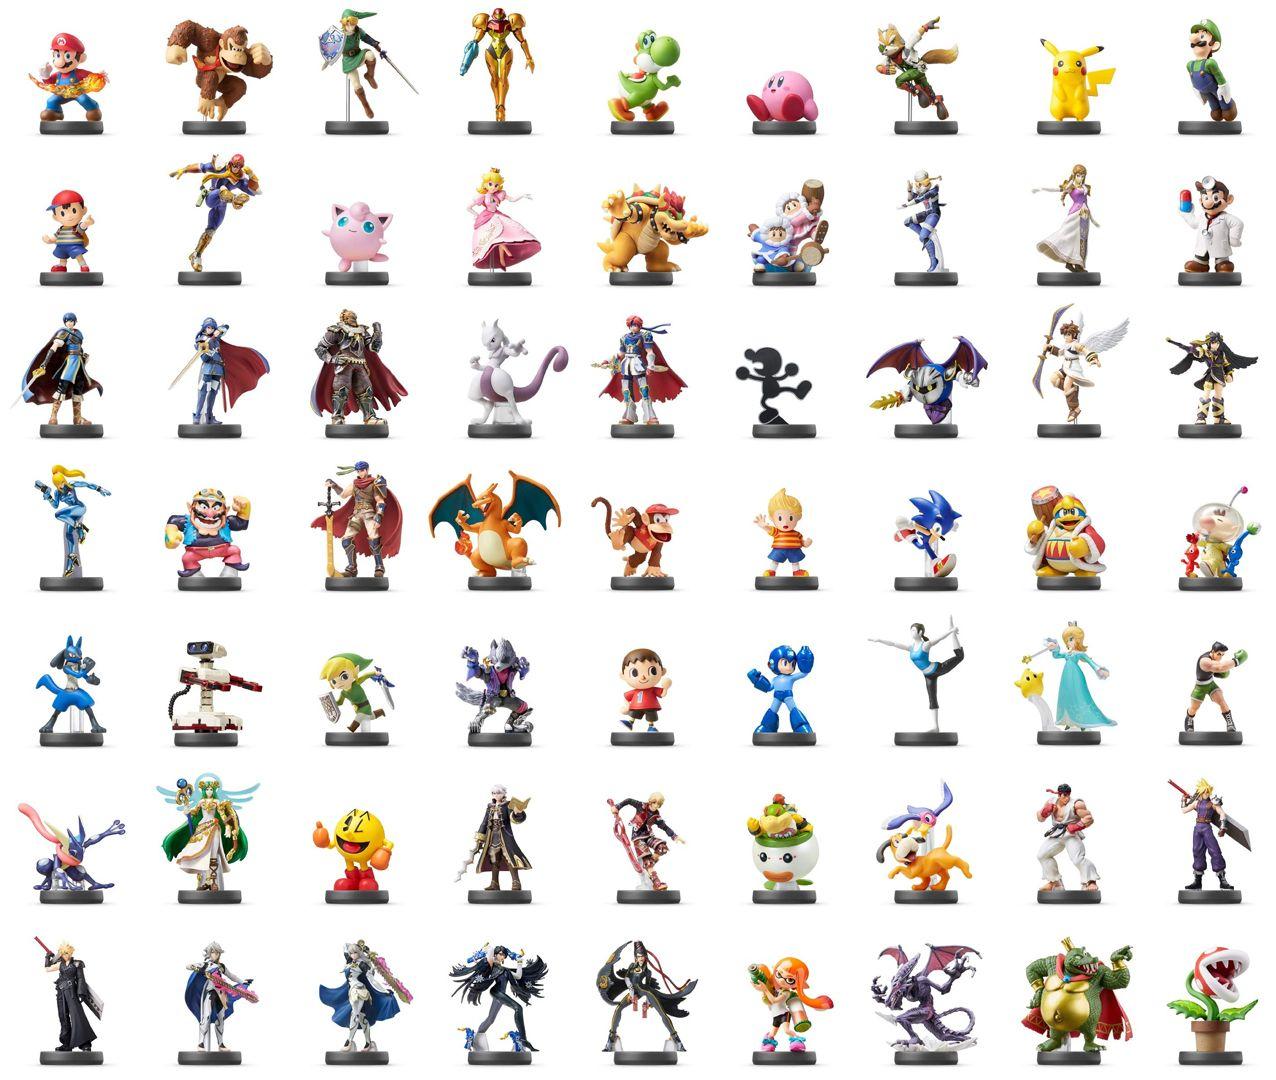 7dc8f8c7-1874-4882-aa14-b2a2362f14d0 acheter n2 elite dans Nintendo Switch